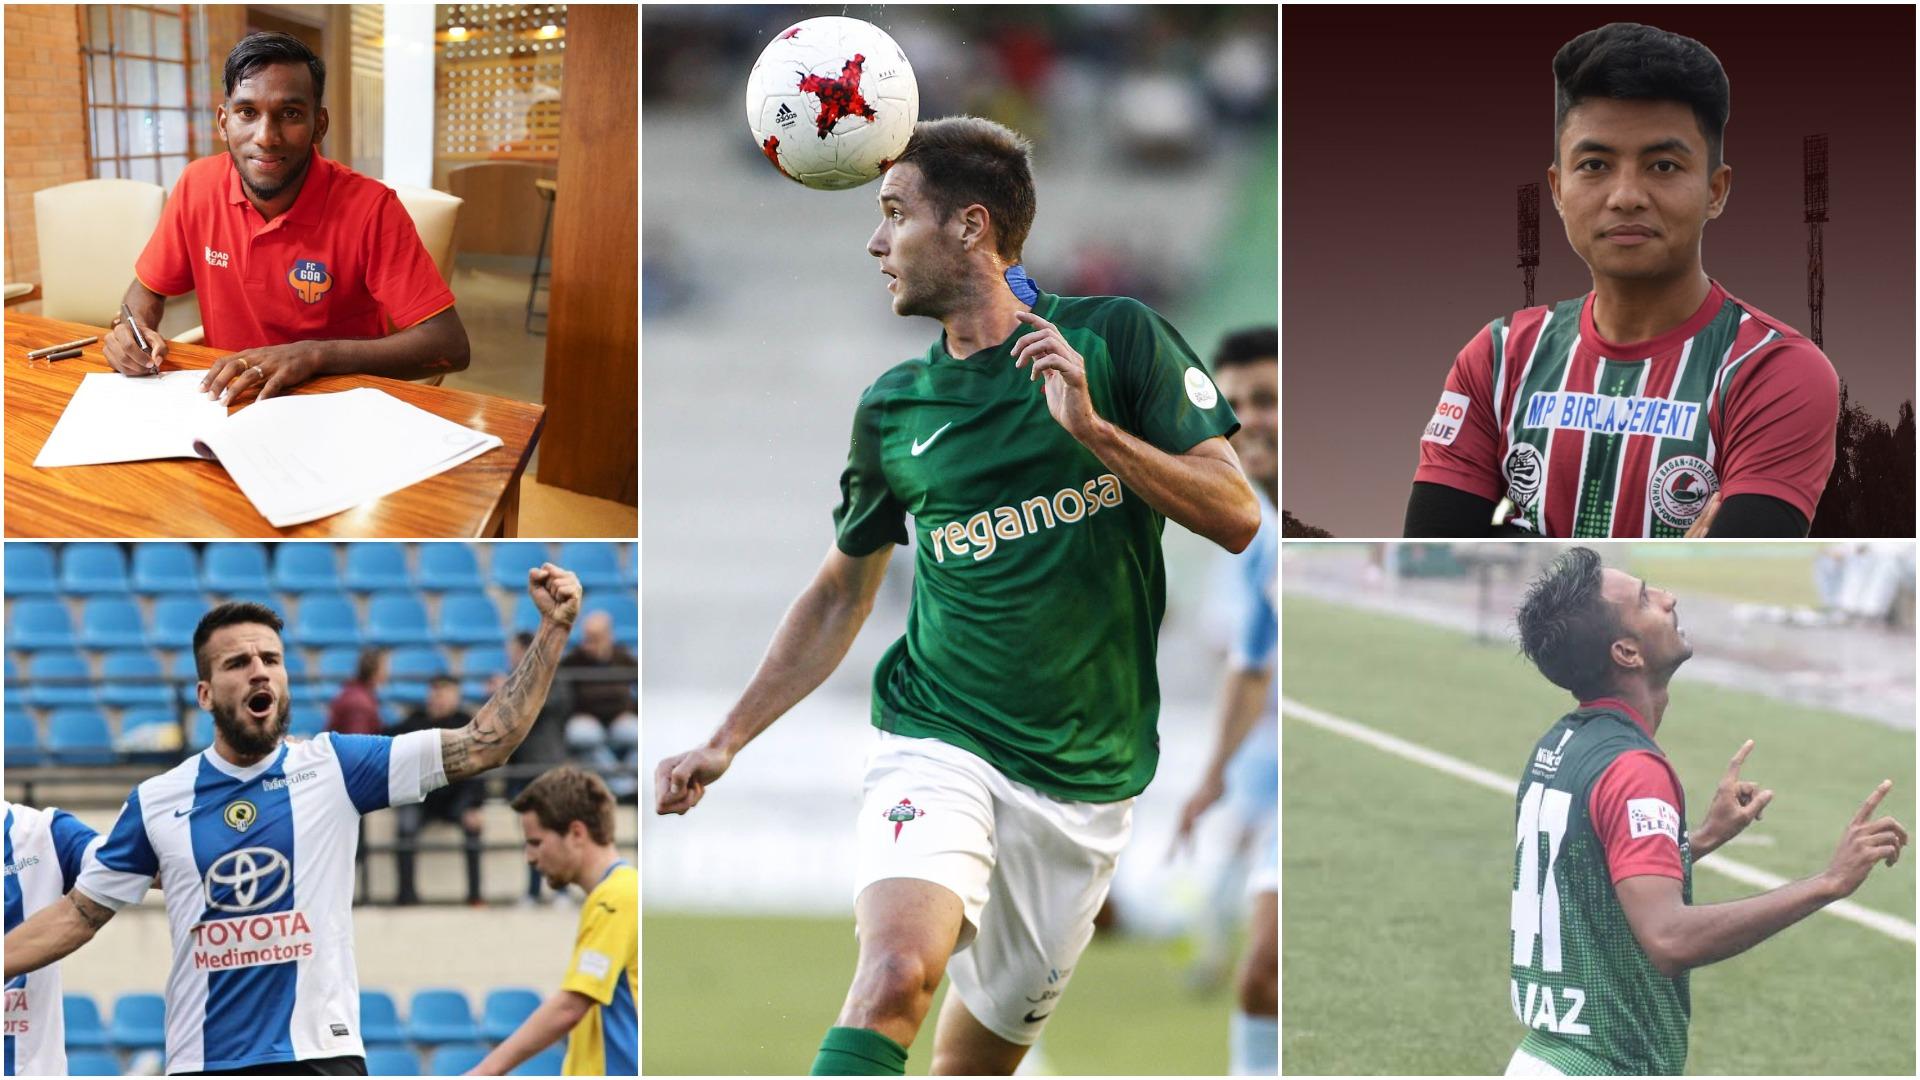 Alexander Romario Jesuraj joins on loan from FC Goa; Spanish midfielders Francisco Javier González Muñoz and Joseba Beitia sign on, and Lalramzauva Khiangte and Sheikh Faiaz make their loan deals permanent.